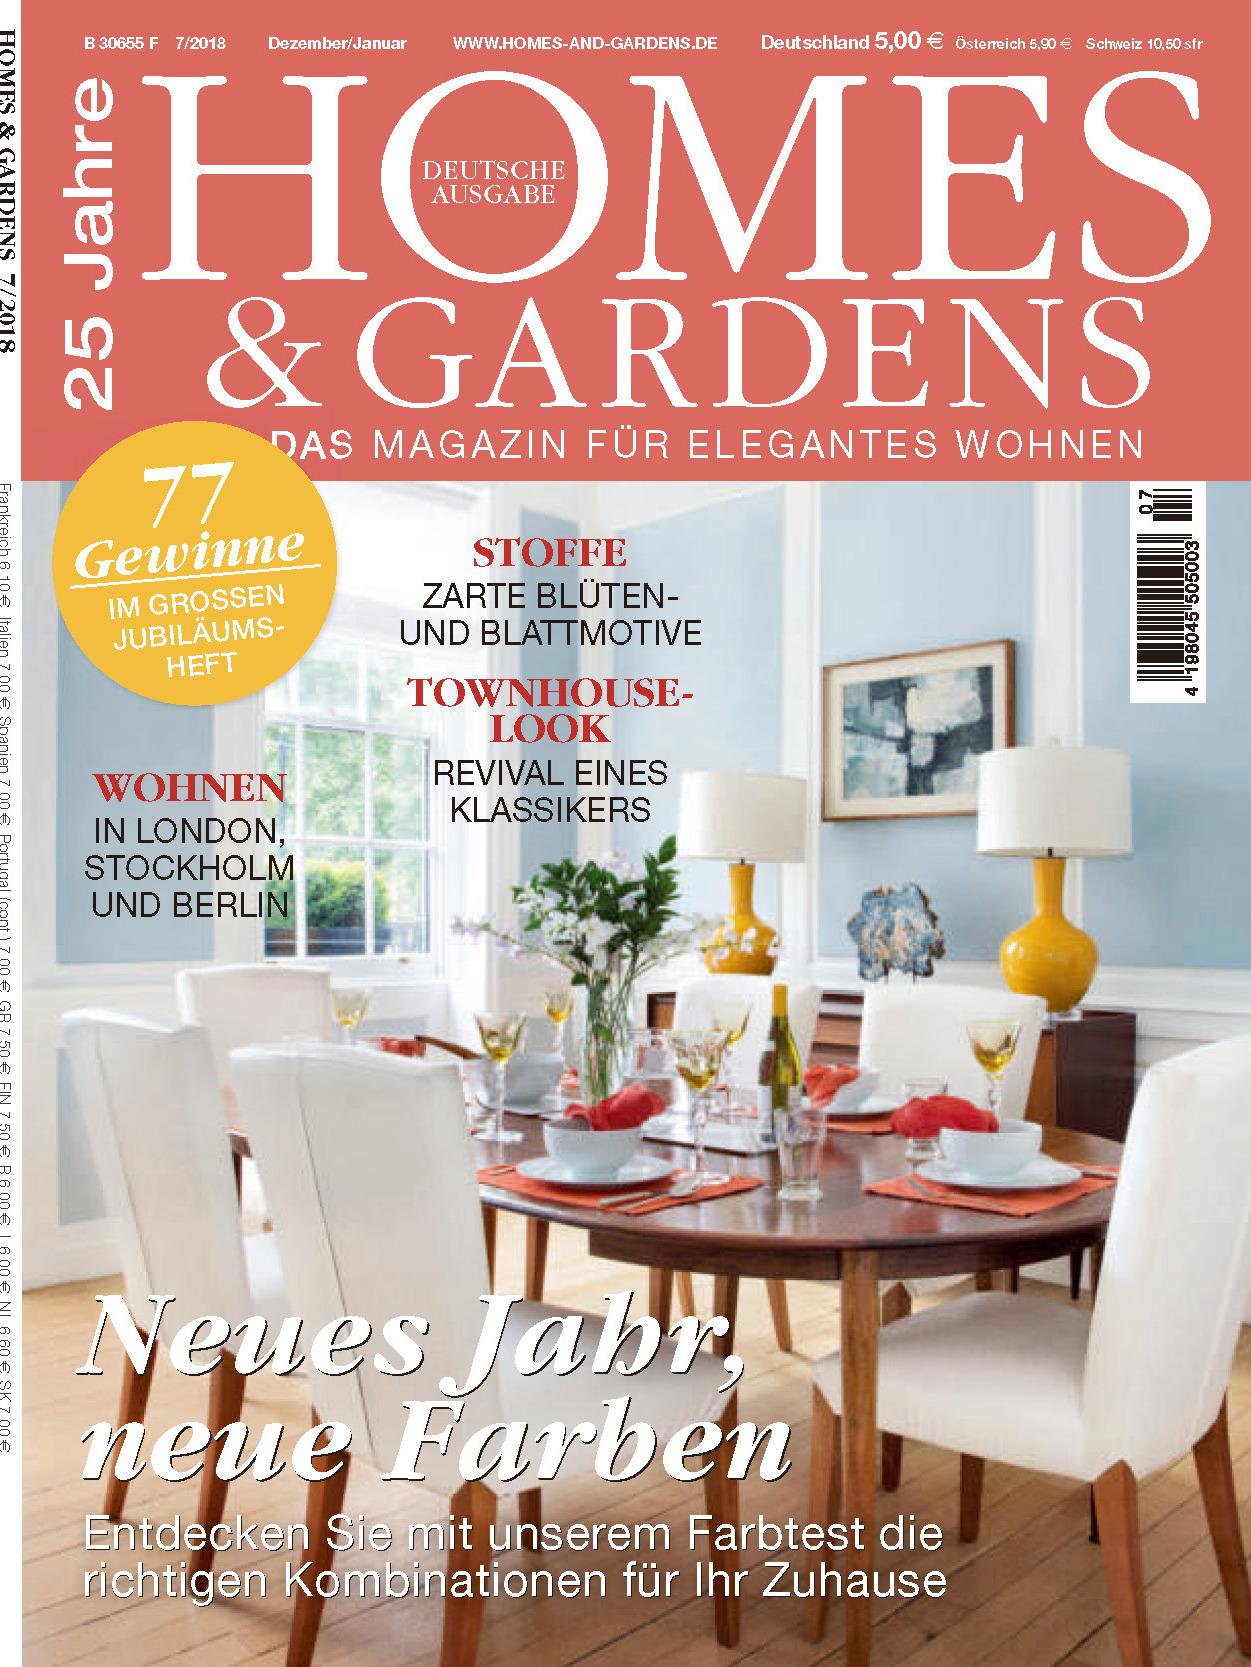 《Homes & Gardens》德国版时尚家居杂志2018年12-2019年01月号